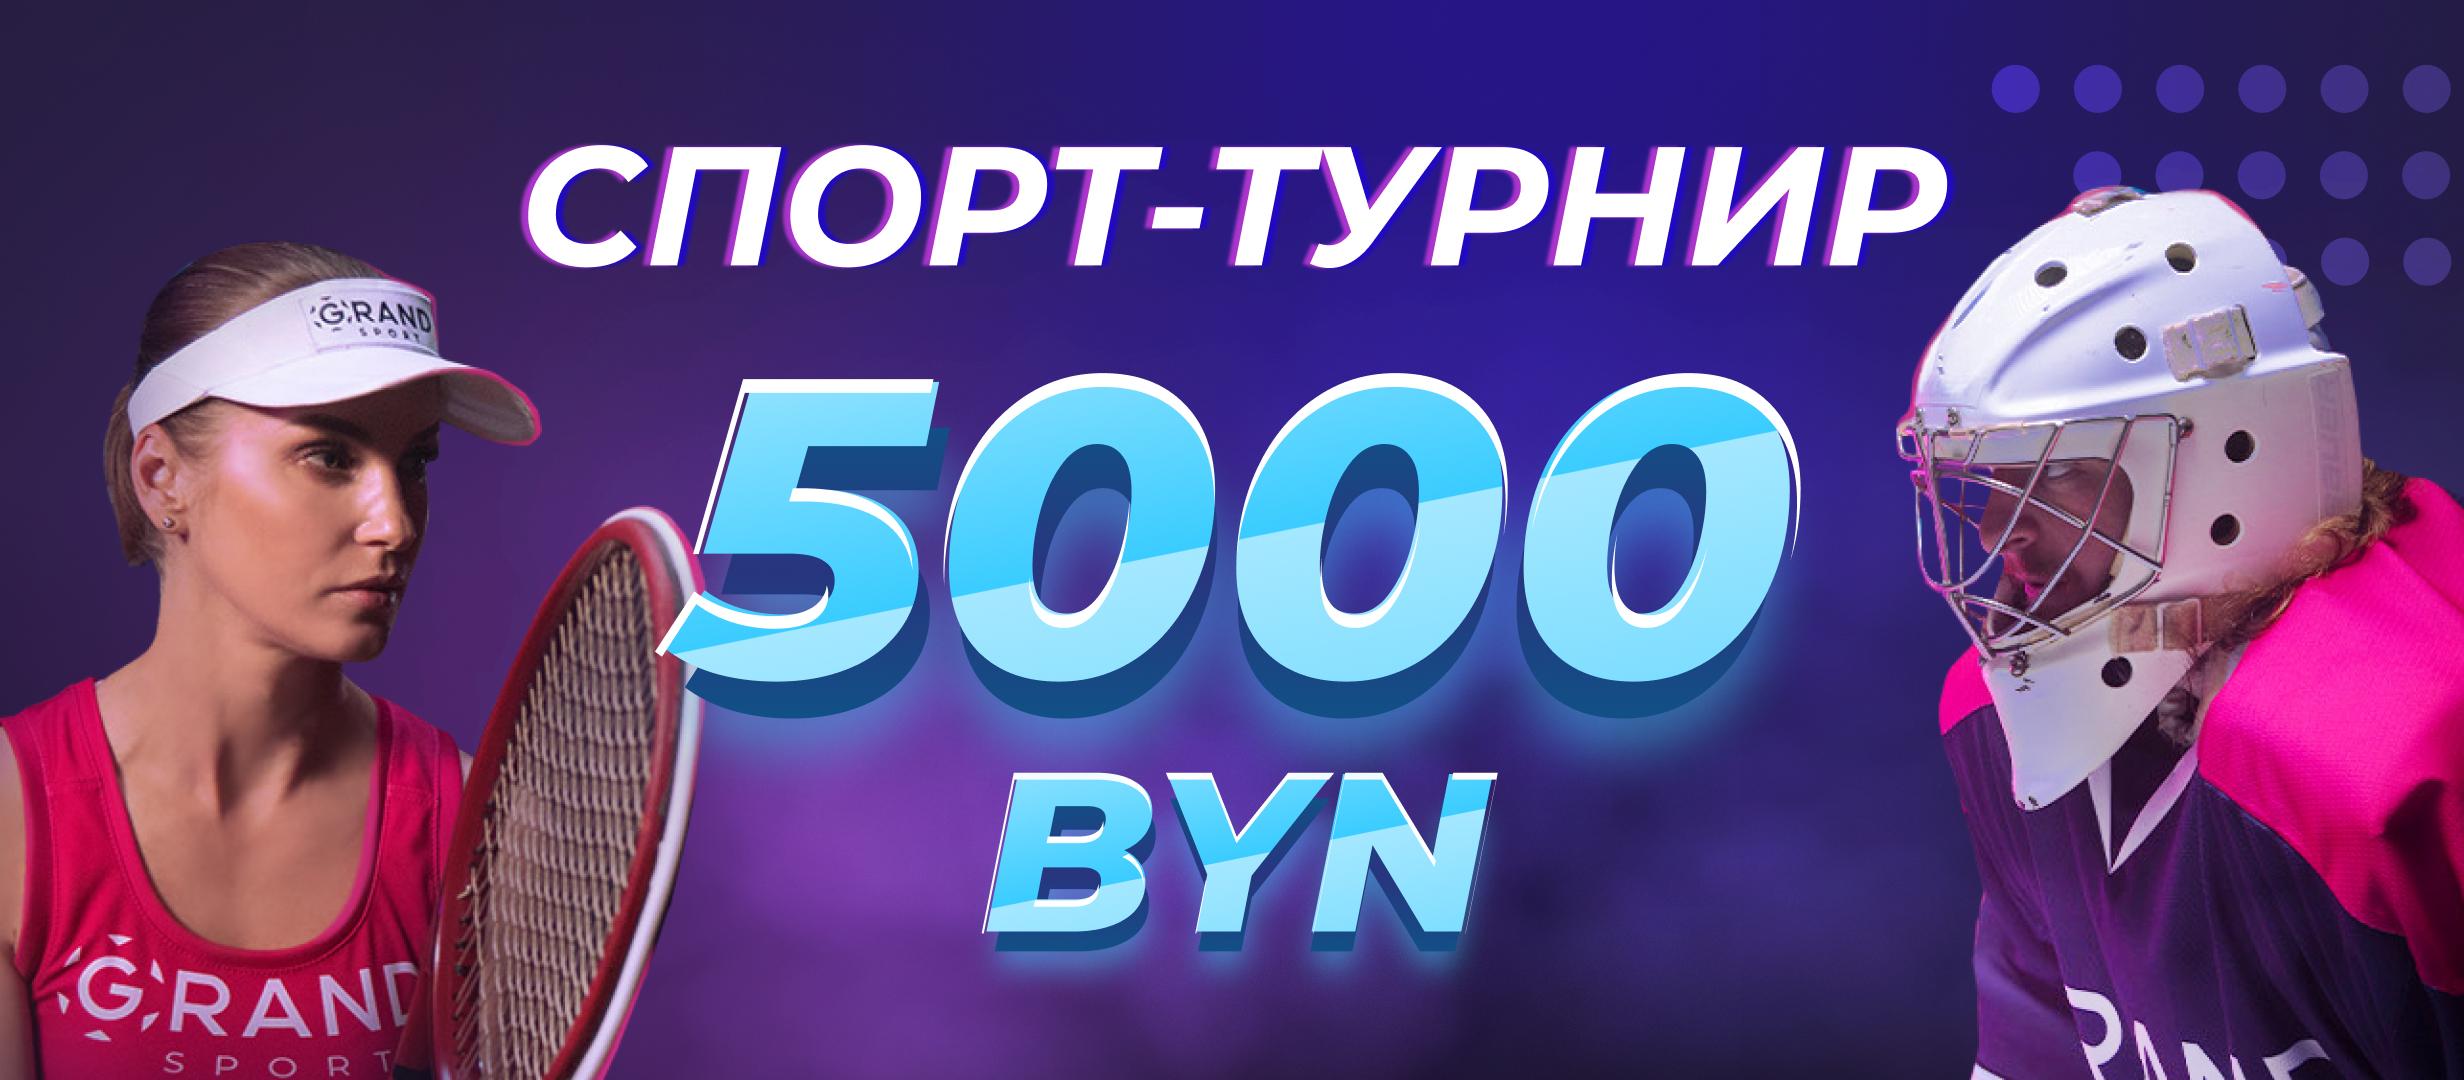 Кеш-бонус от Grandsport 1000 руб..